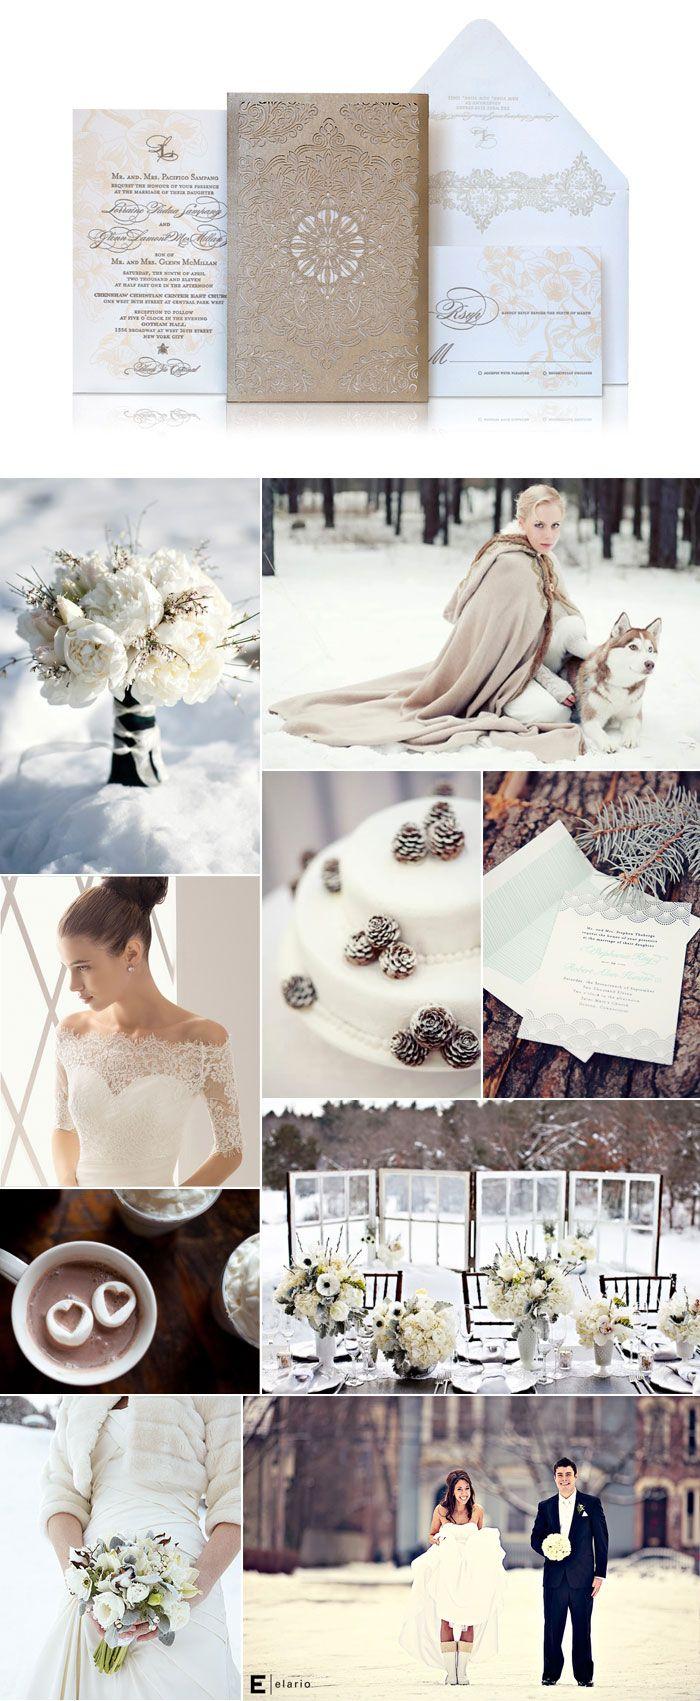 Winter white wedding inspiration | Inspiration Boards | Pinterest ...